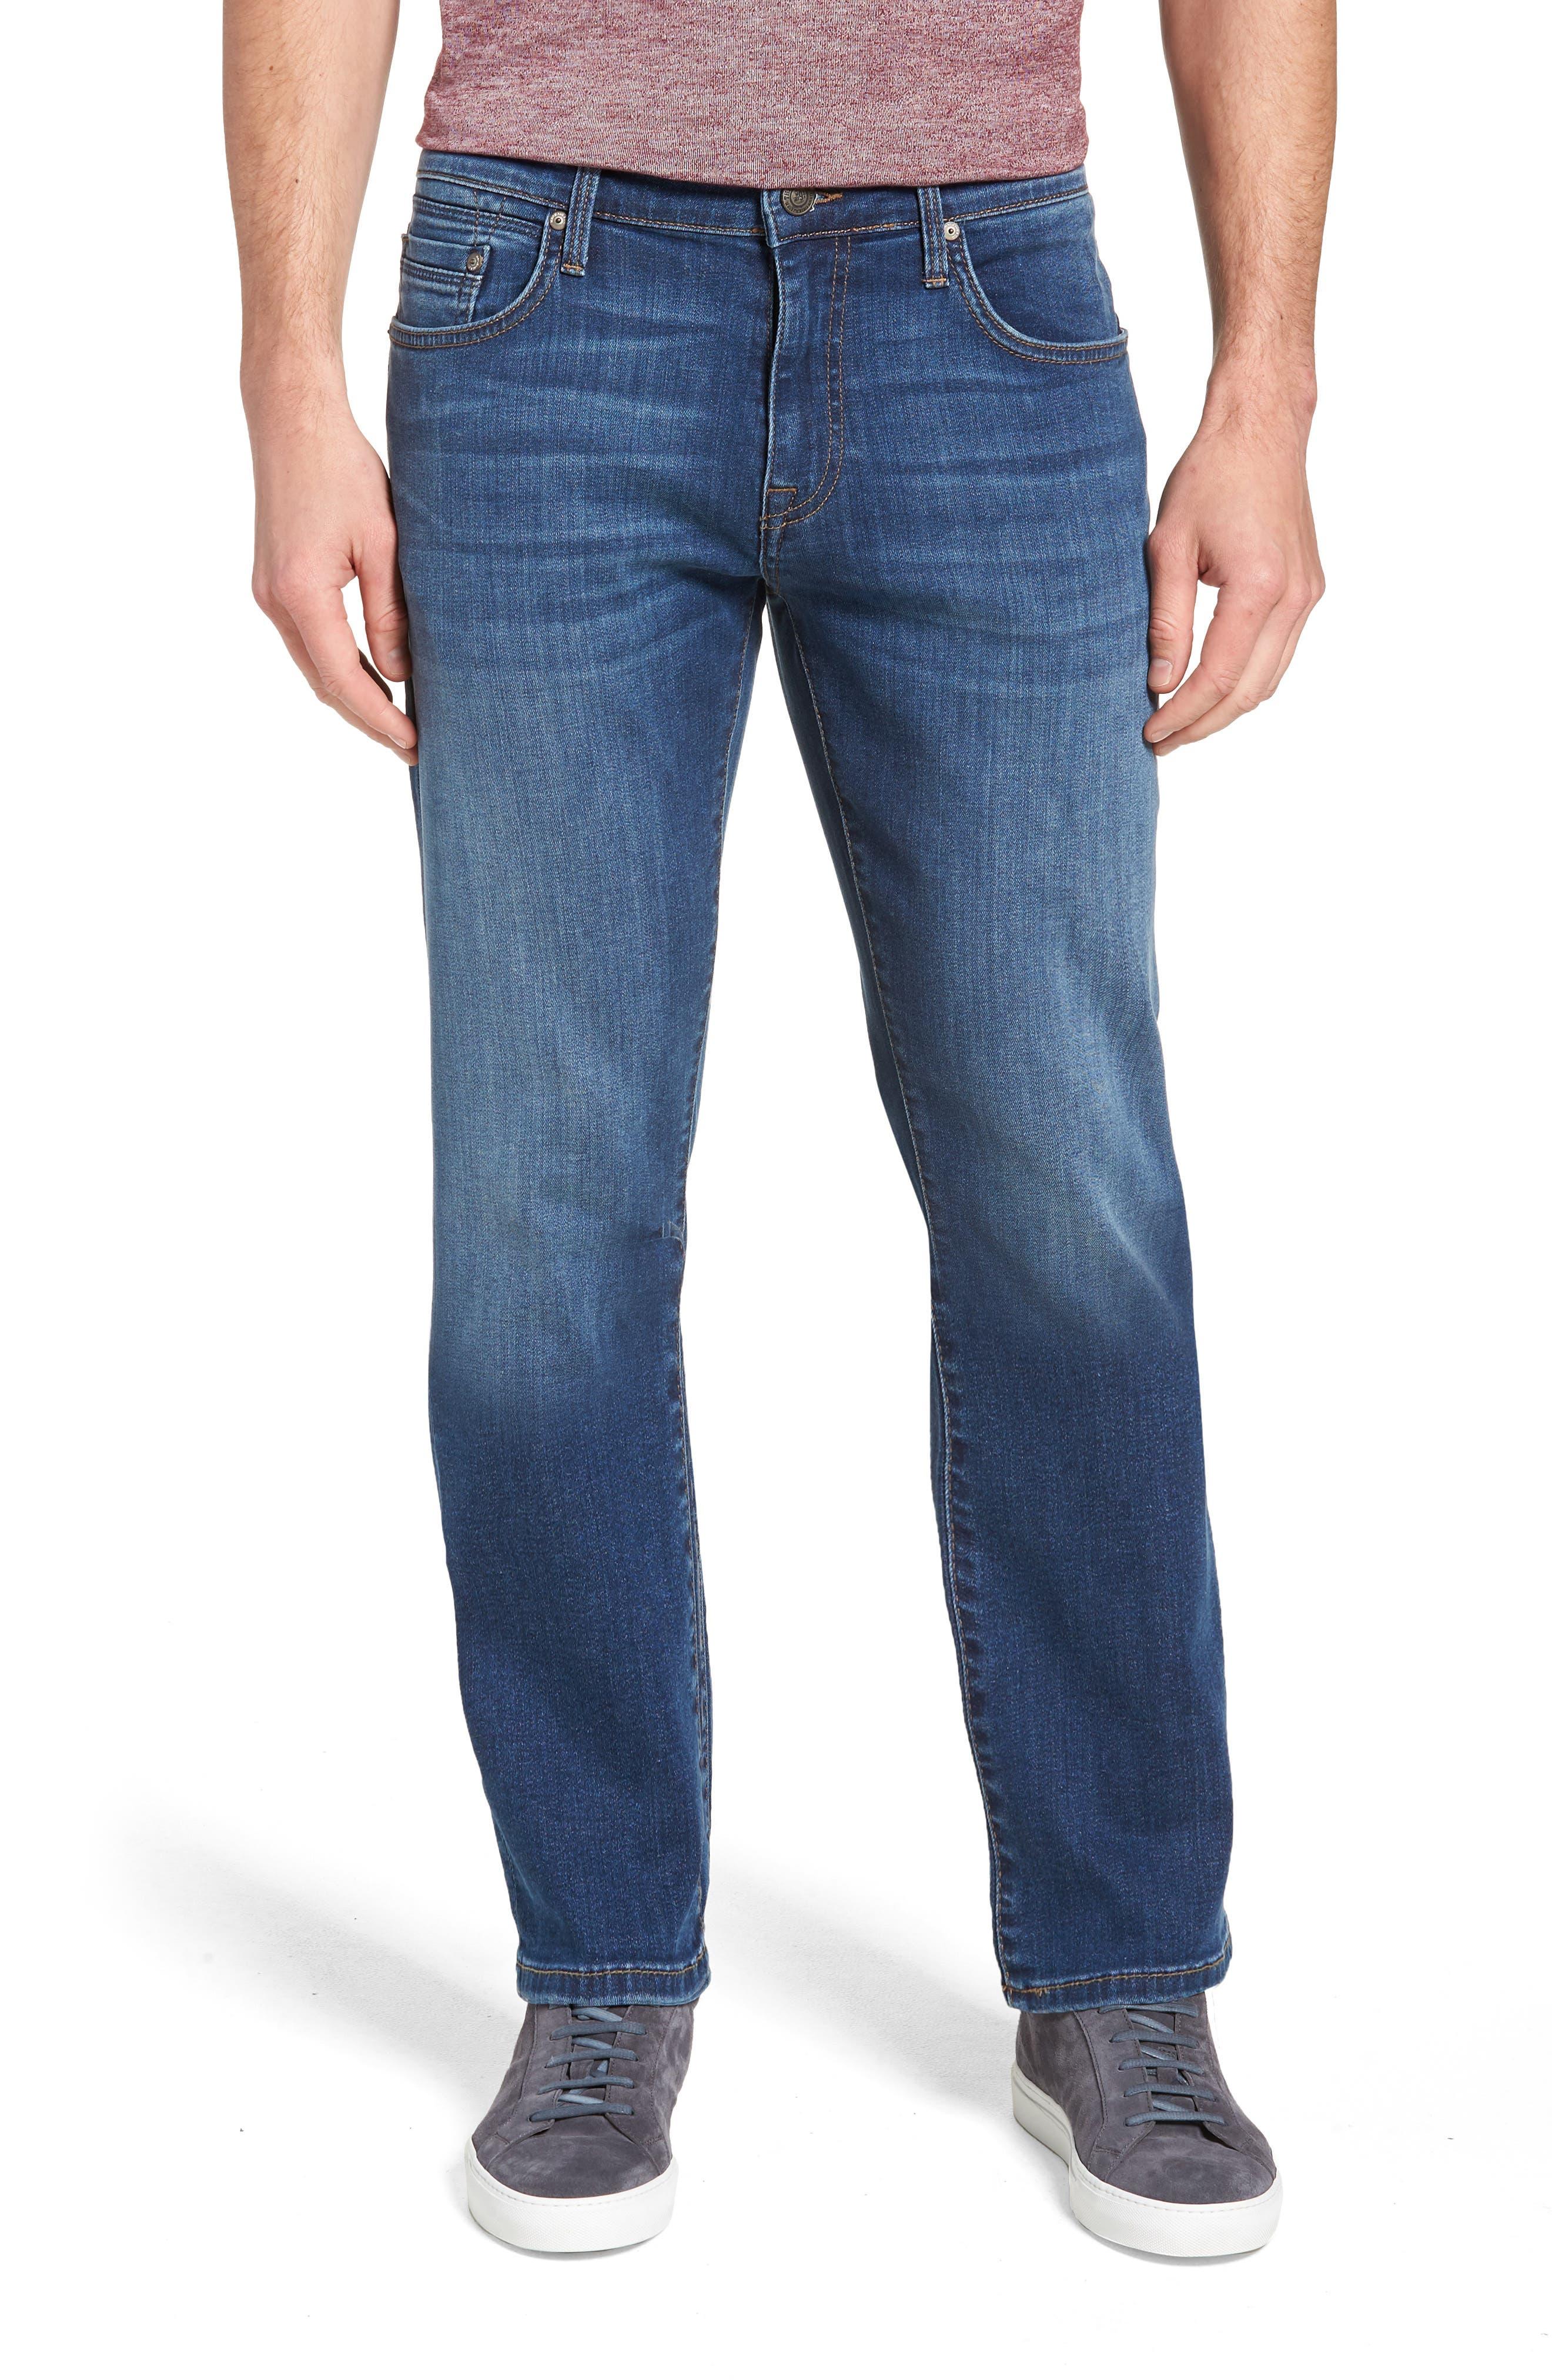 MAVI JEANS Zach Straight Leg Jeans, Main, color, DARK USED CAPITOL HILL